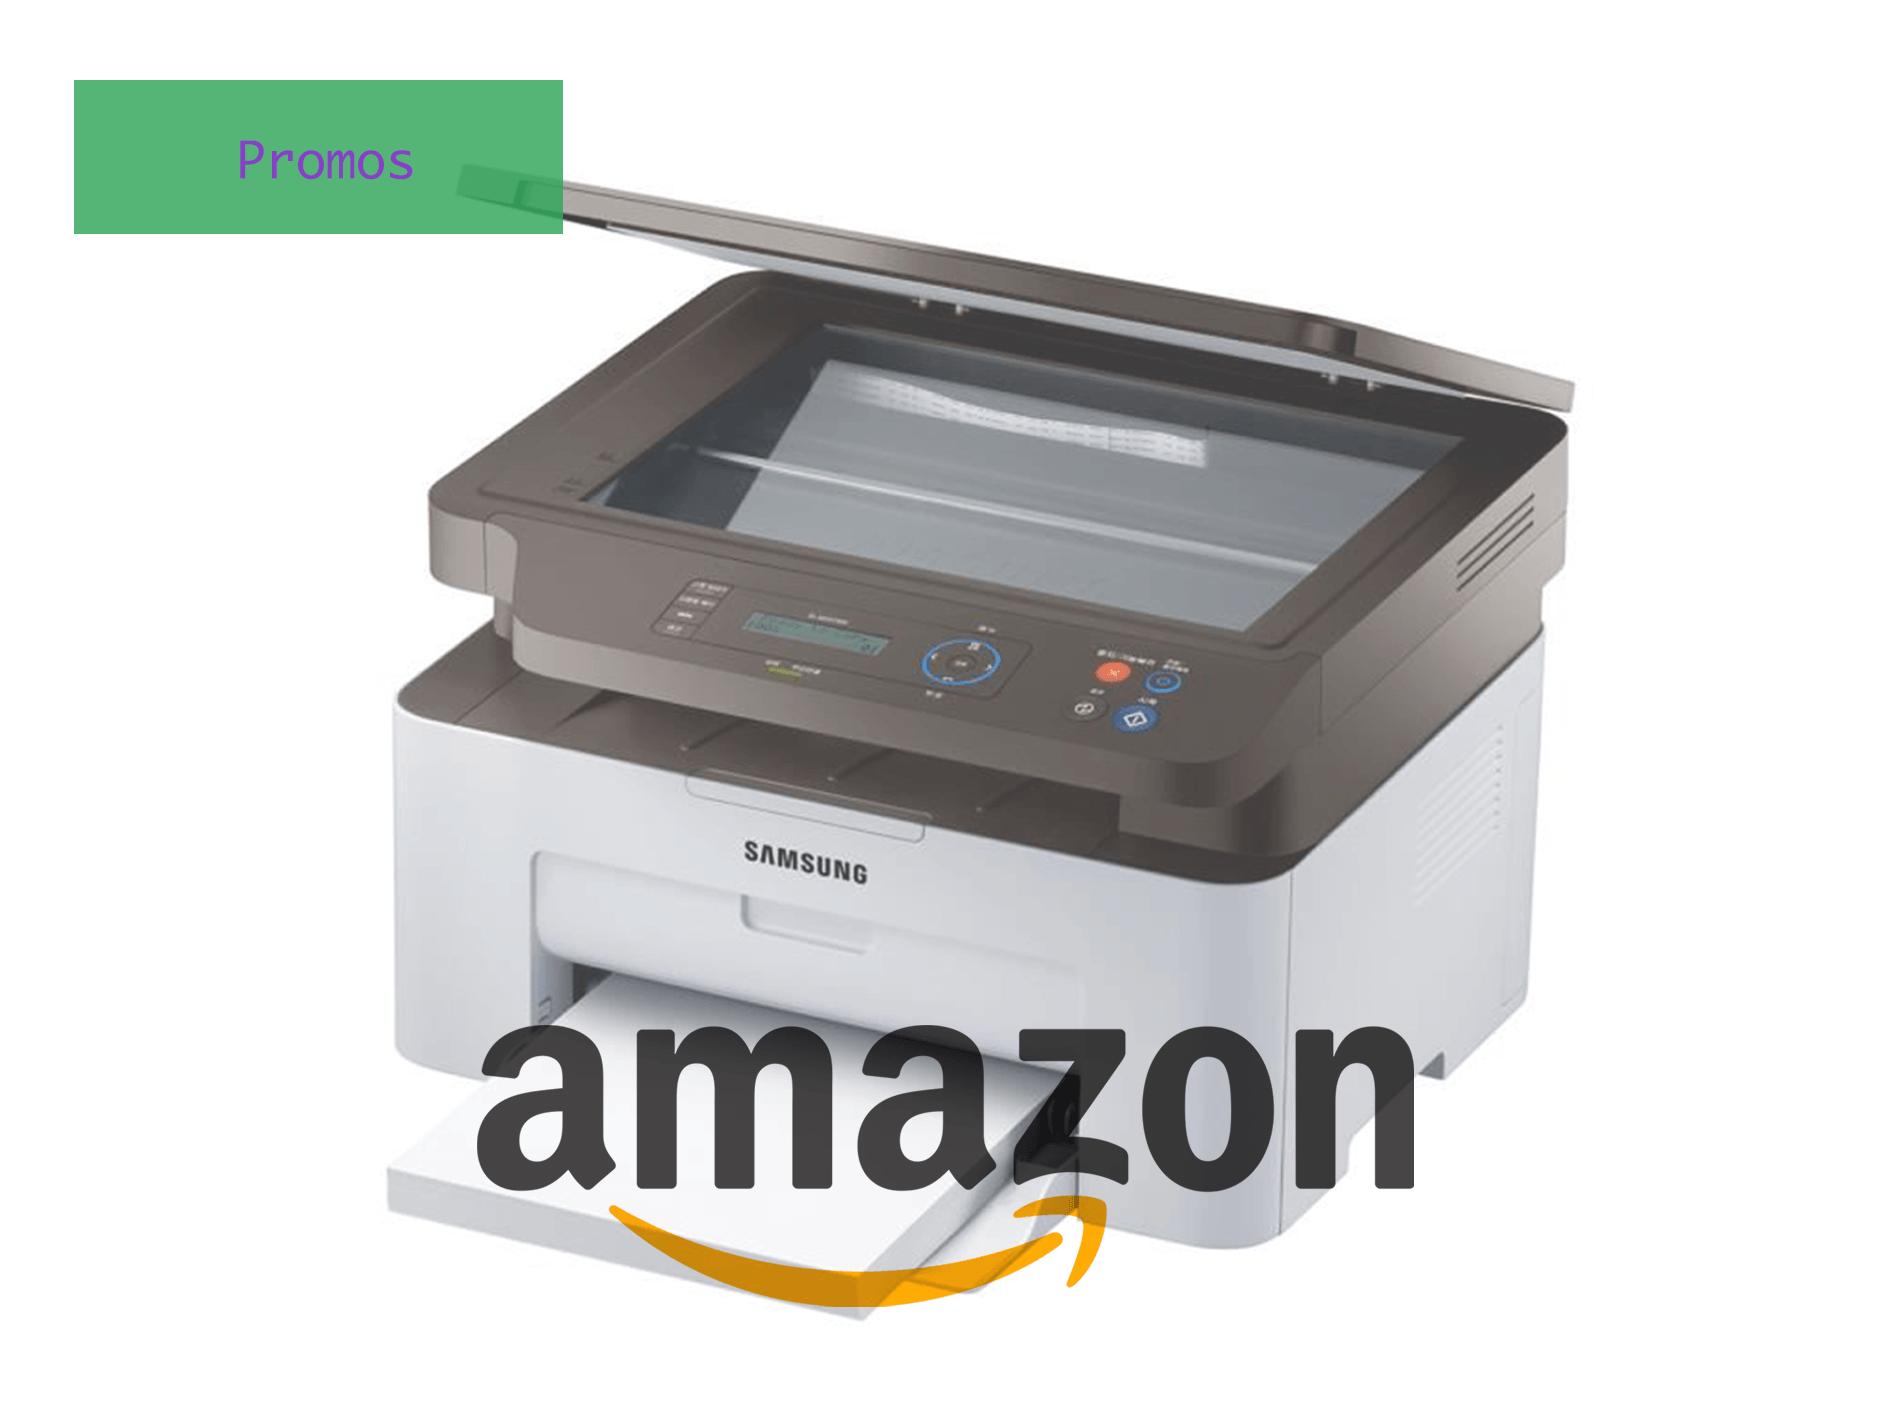 imprimante-laser-amazon